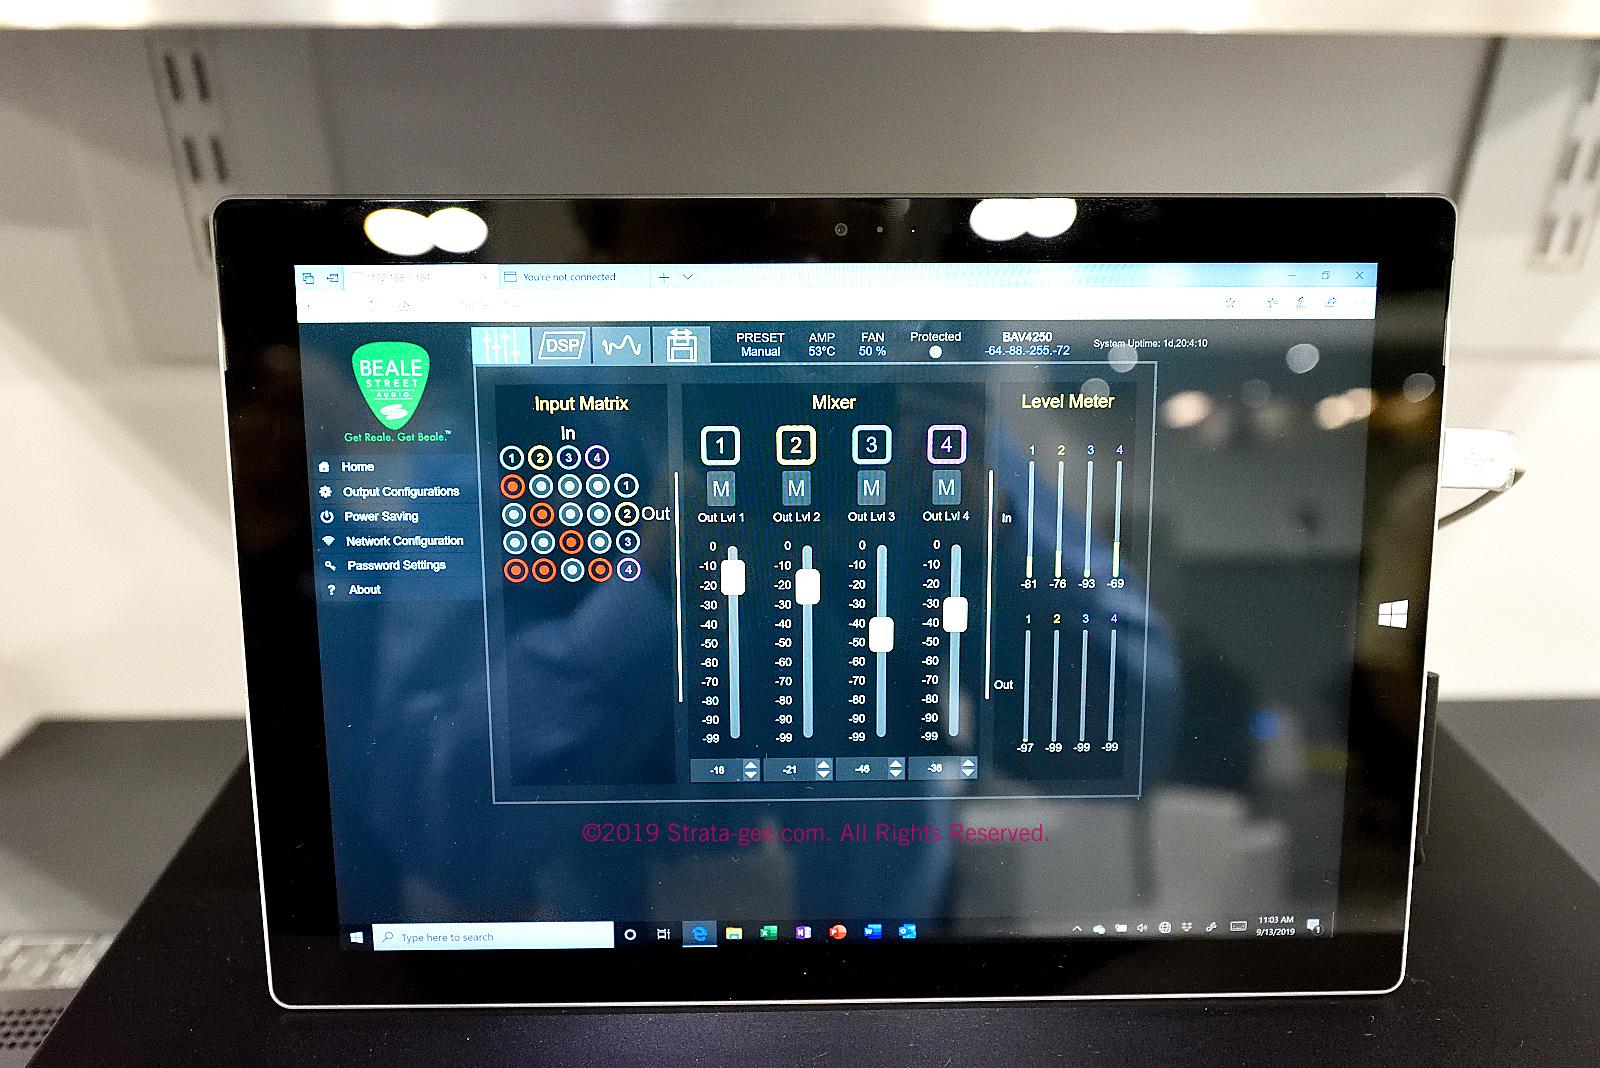 UI showing matrix and zone volume settings